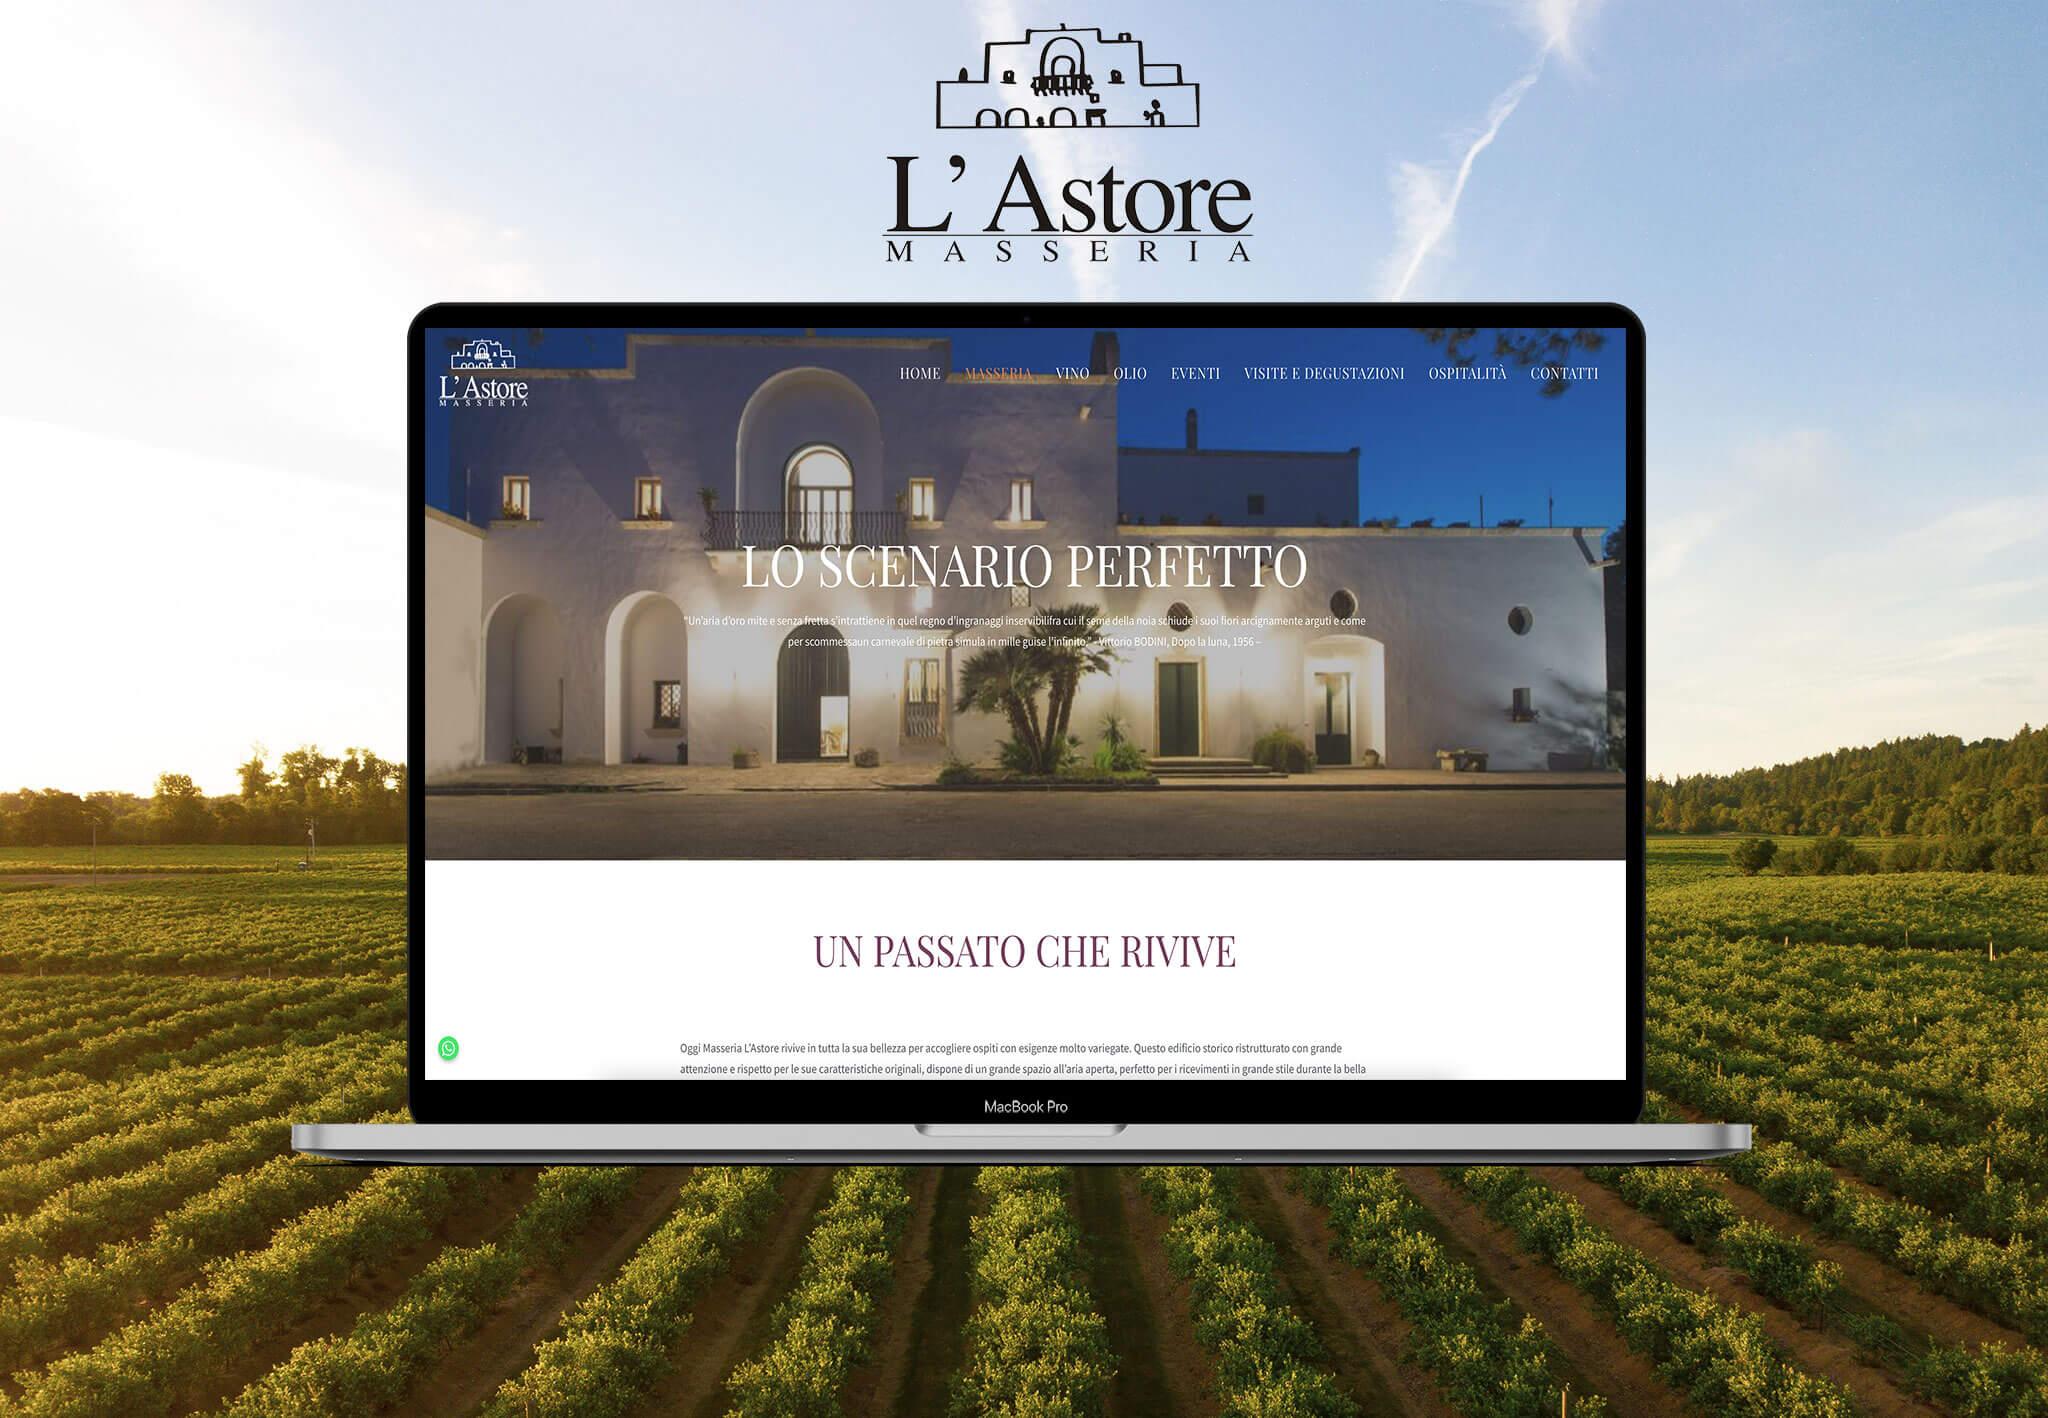 L'Astore Masseria Website